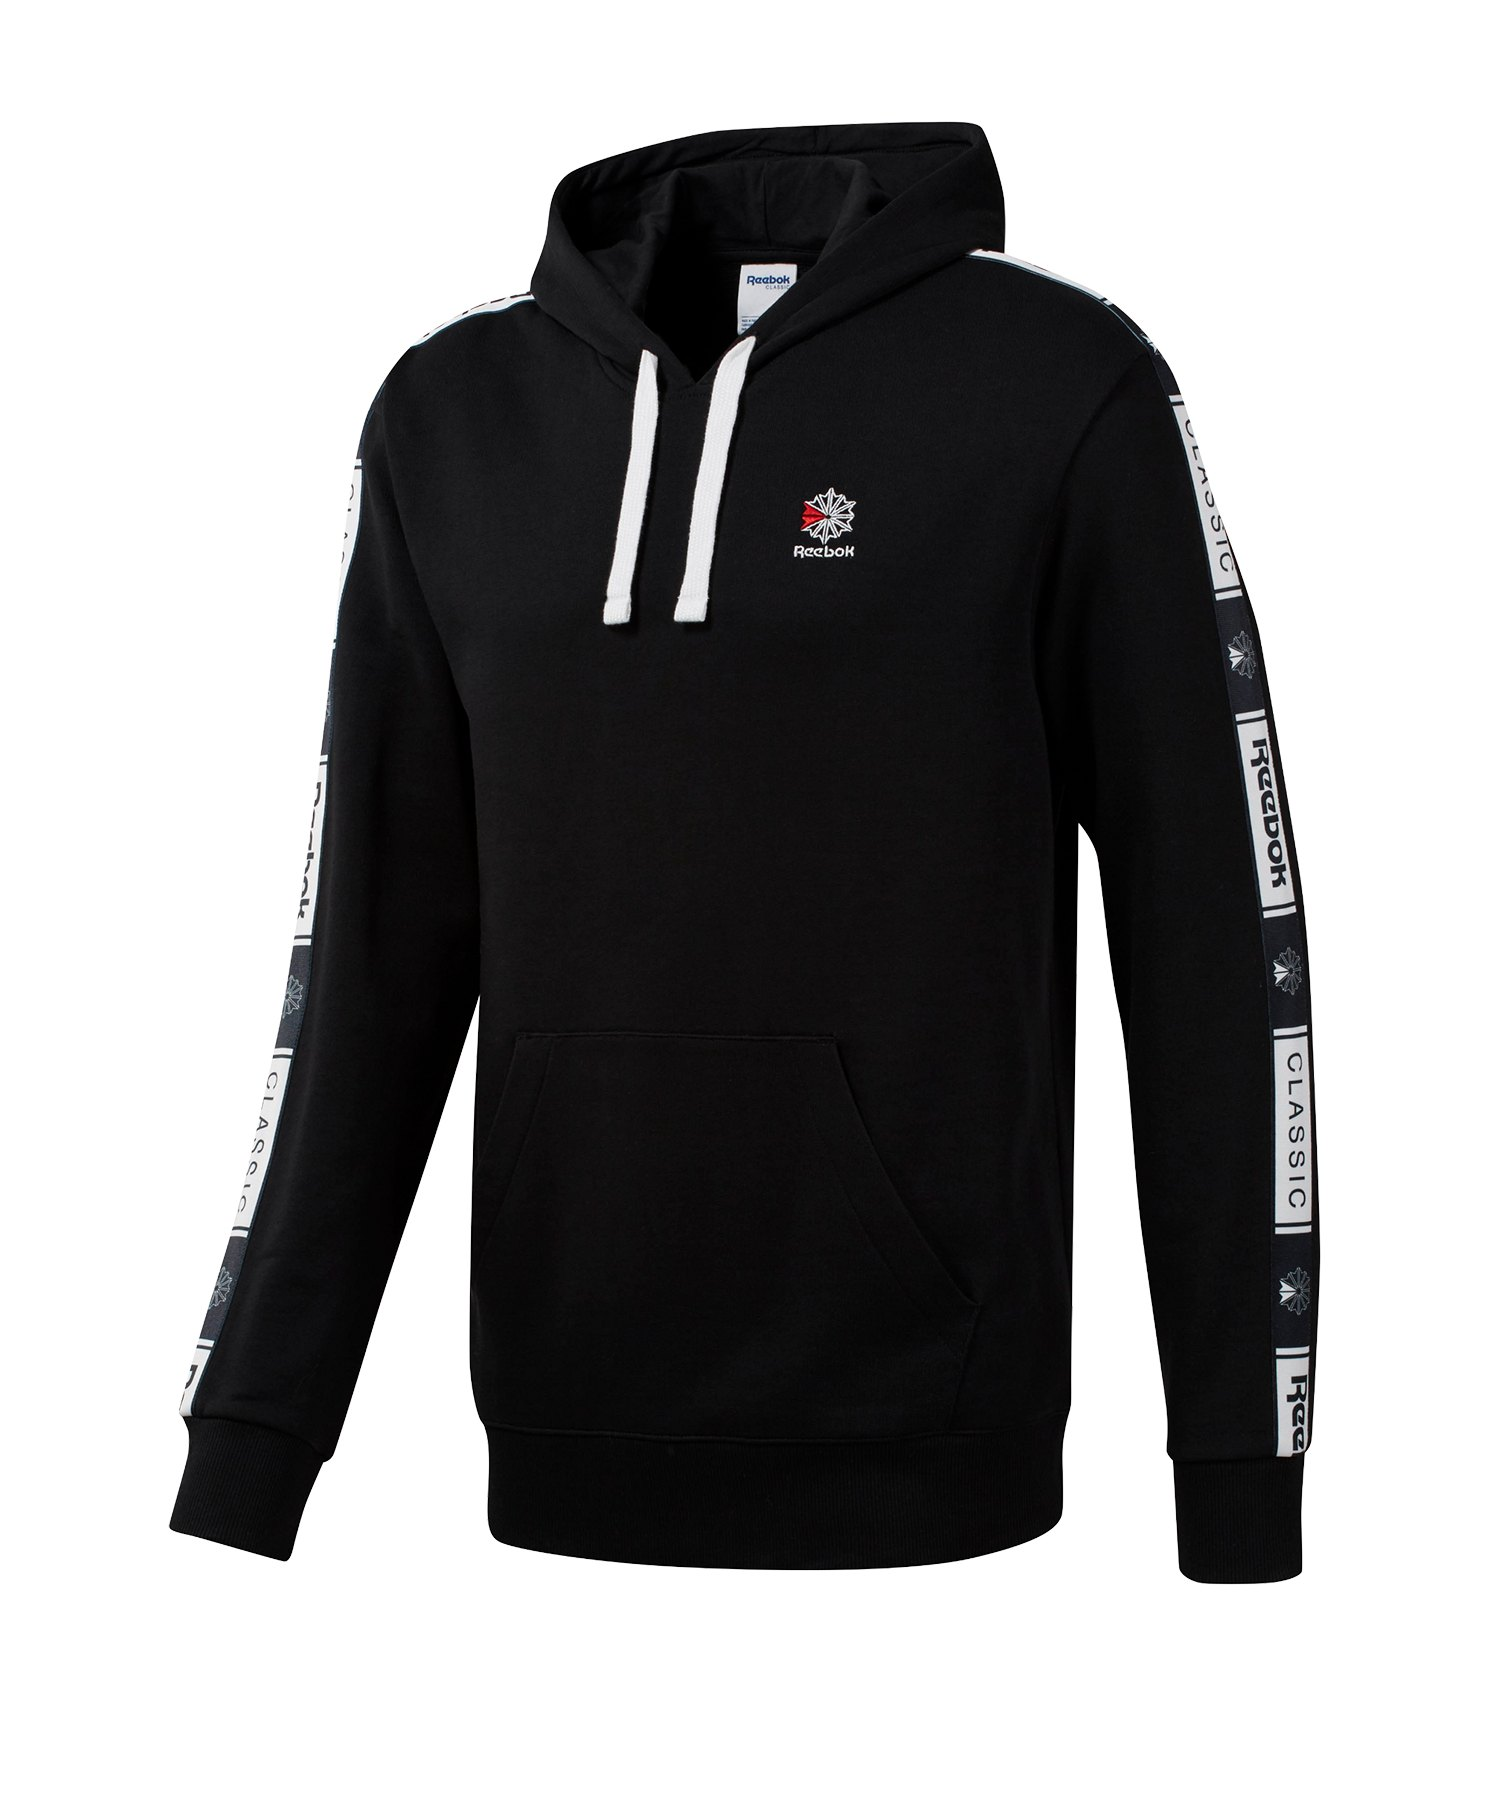 Reebok Classics Taped Kapuzensweatshirt Schwarz - schwarz